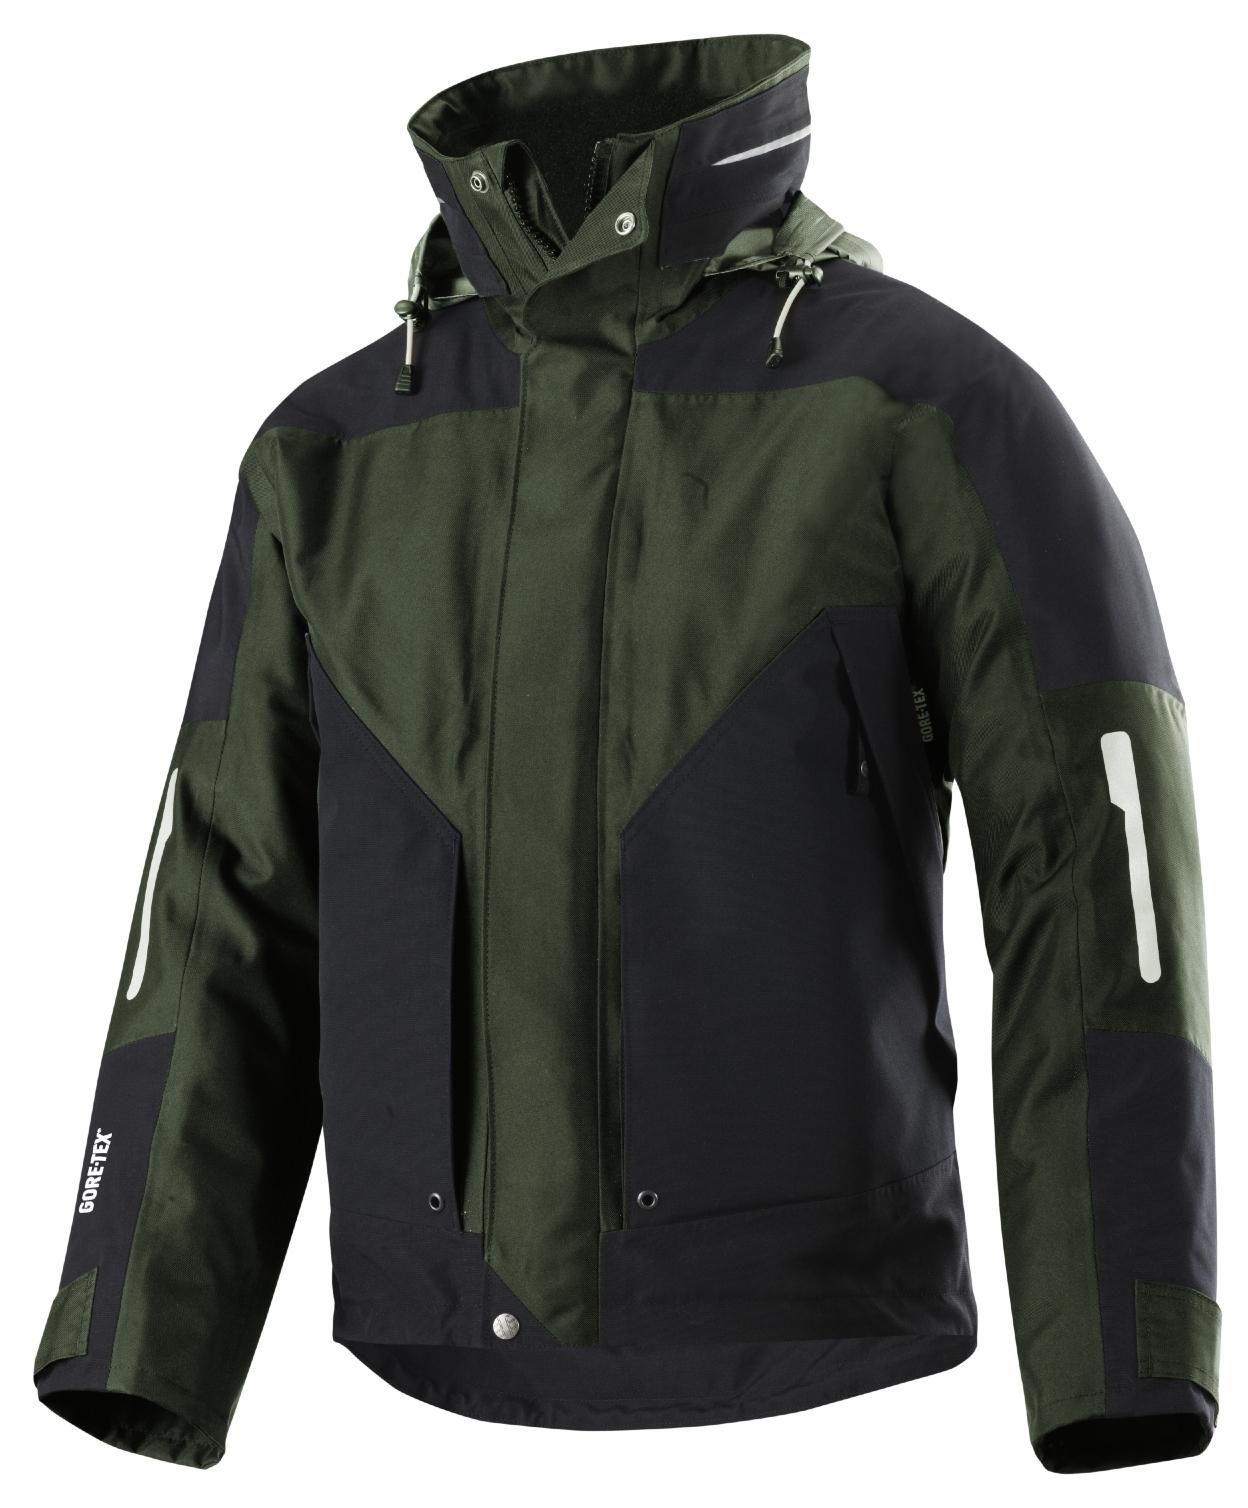 snickers-1988-goretex-winter-jacket-w0h0q100i4367